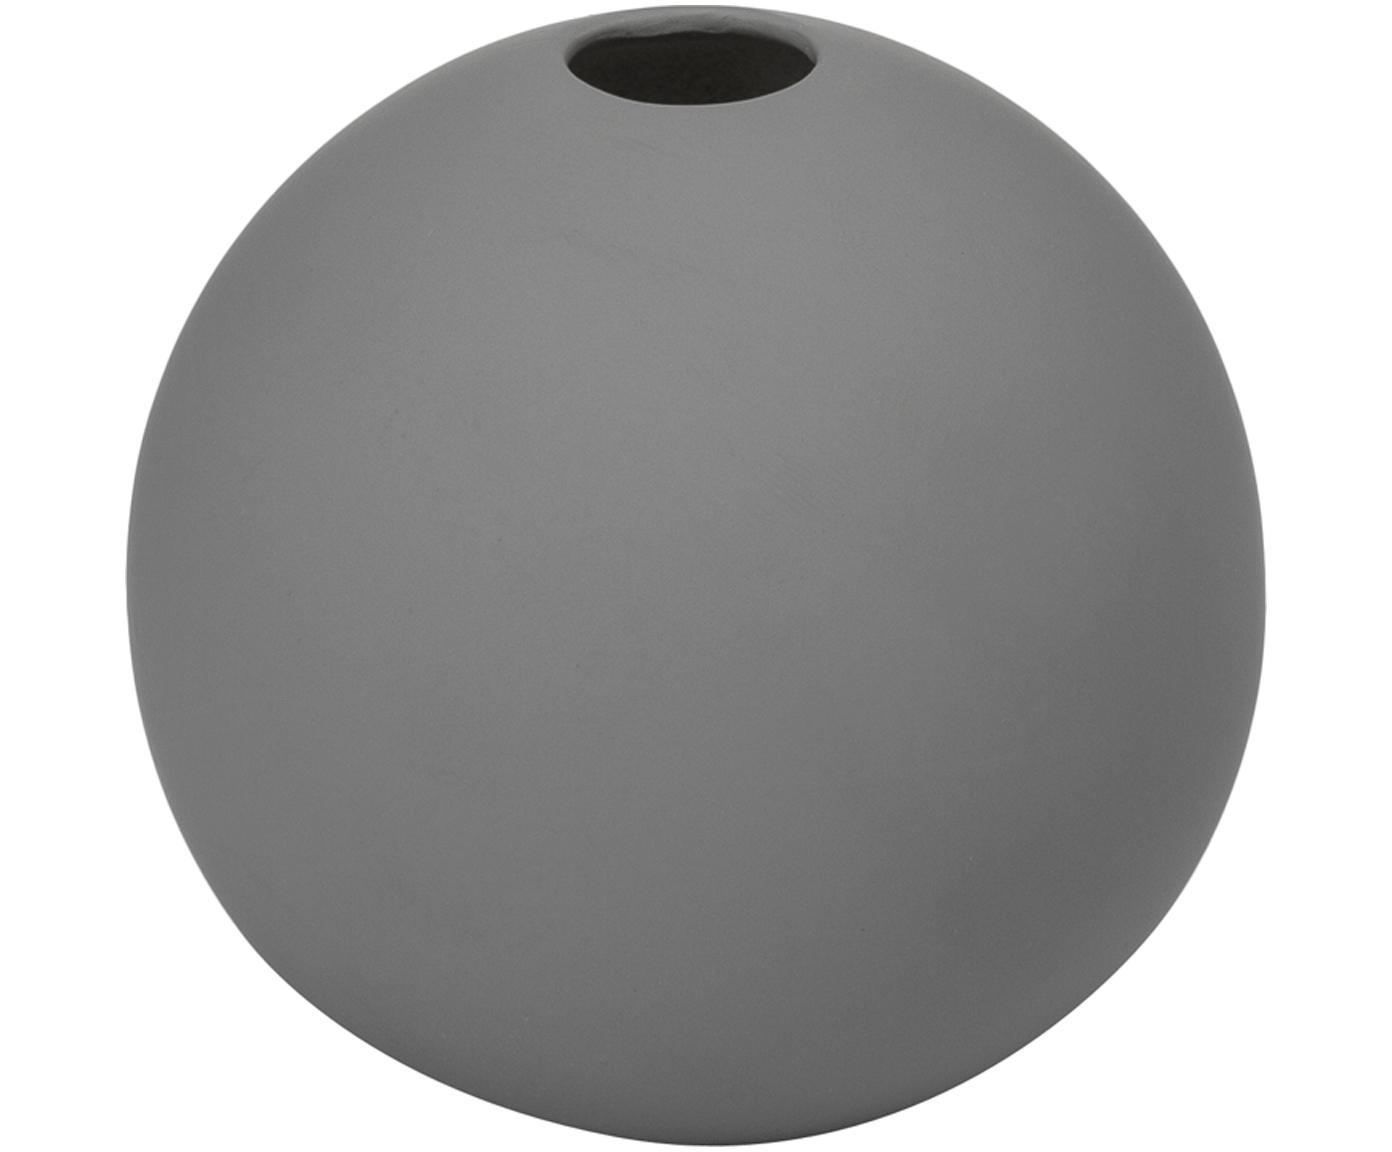 Handgefertigte Kugel-Vase Ball, Keramik, Grau, Ø 8 x H 8 cm